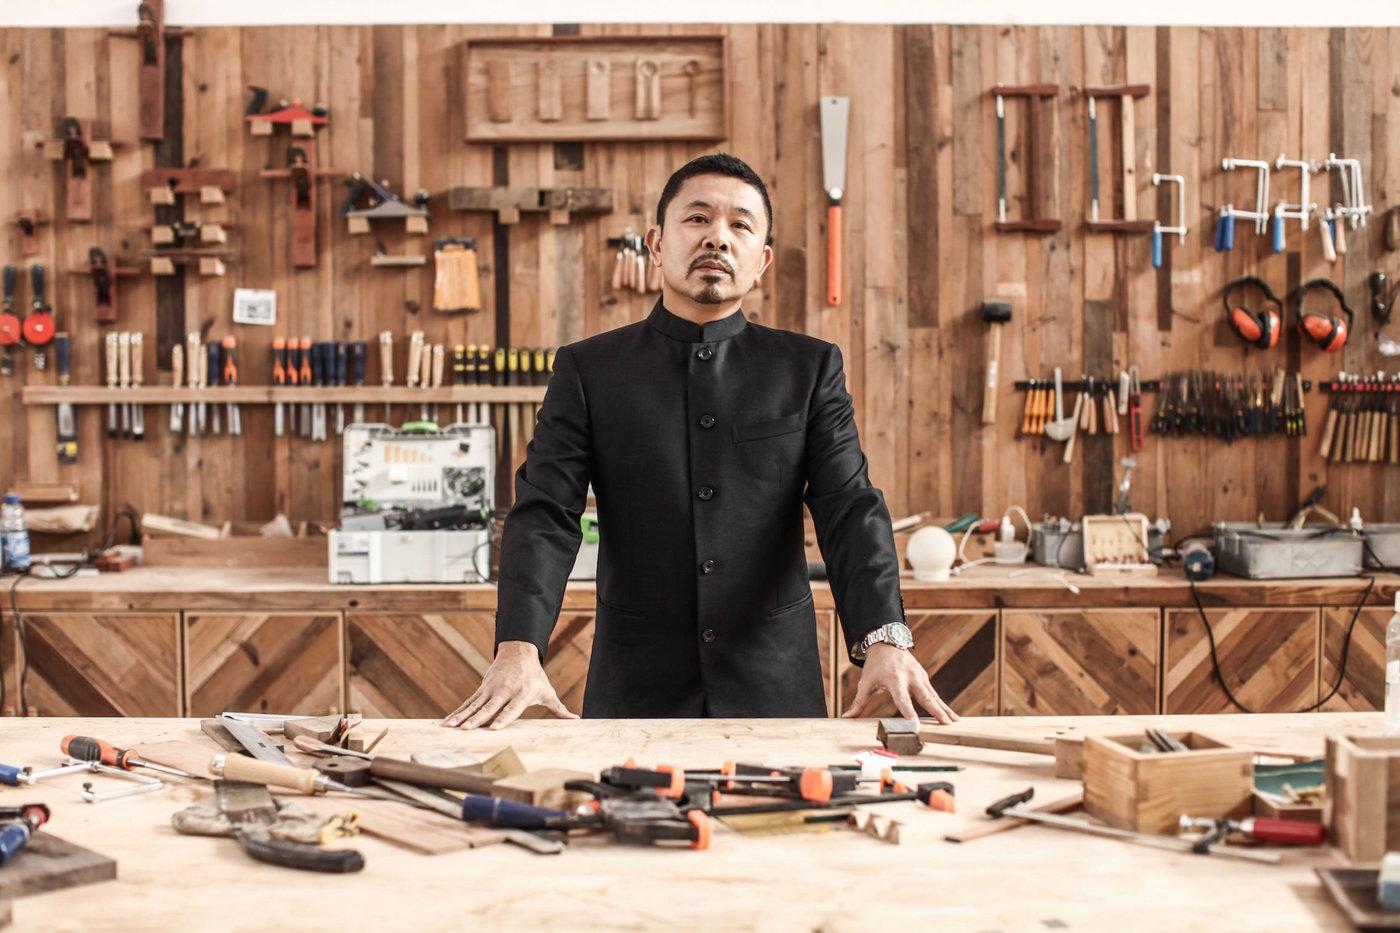 WE+空间CEO柯罗尼资本亚太区董事总经理刘彦燊